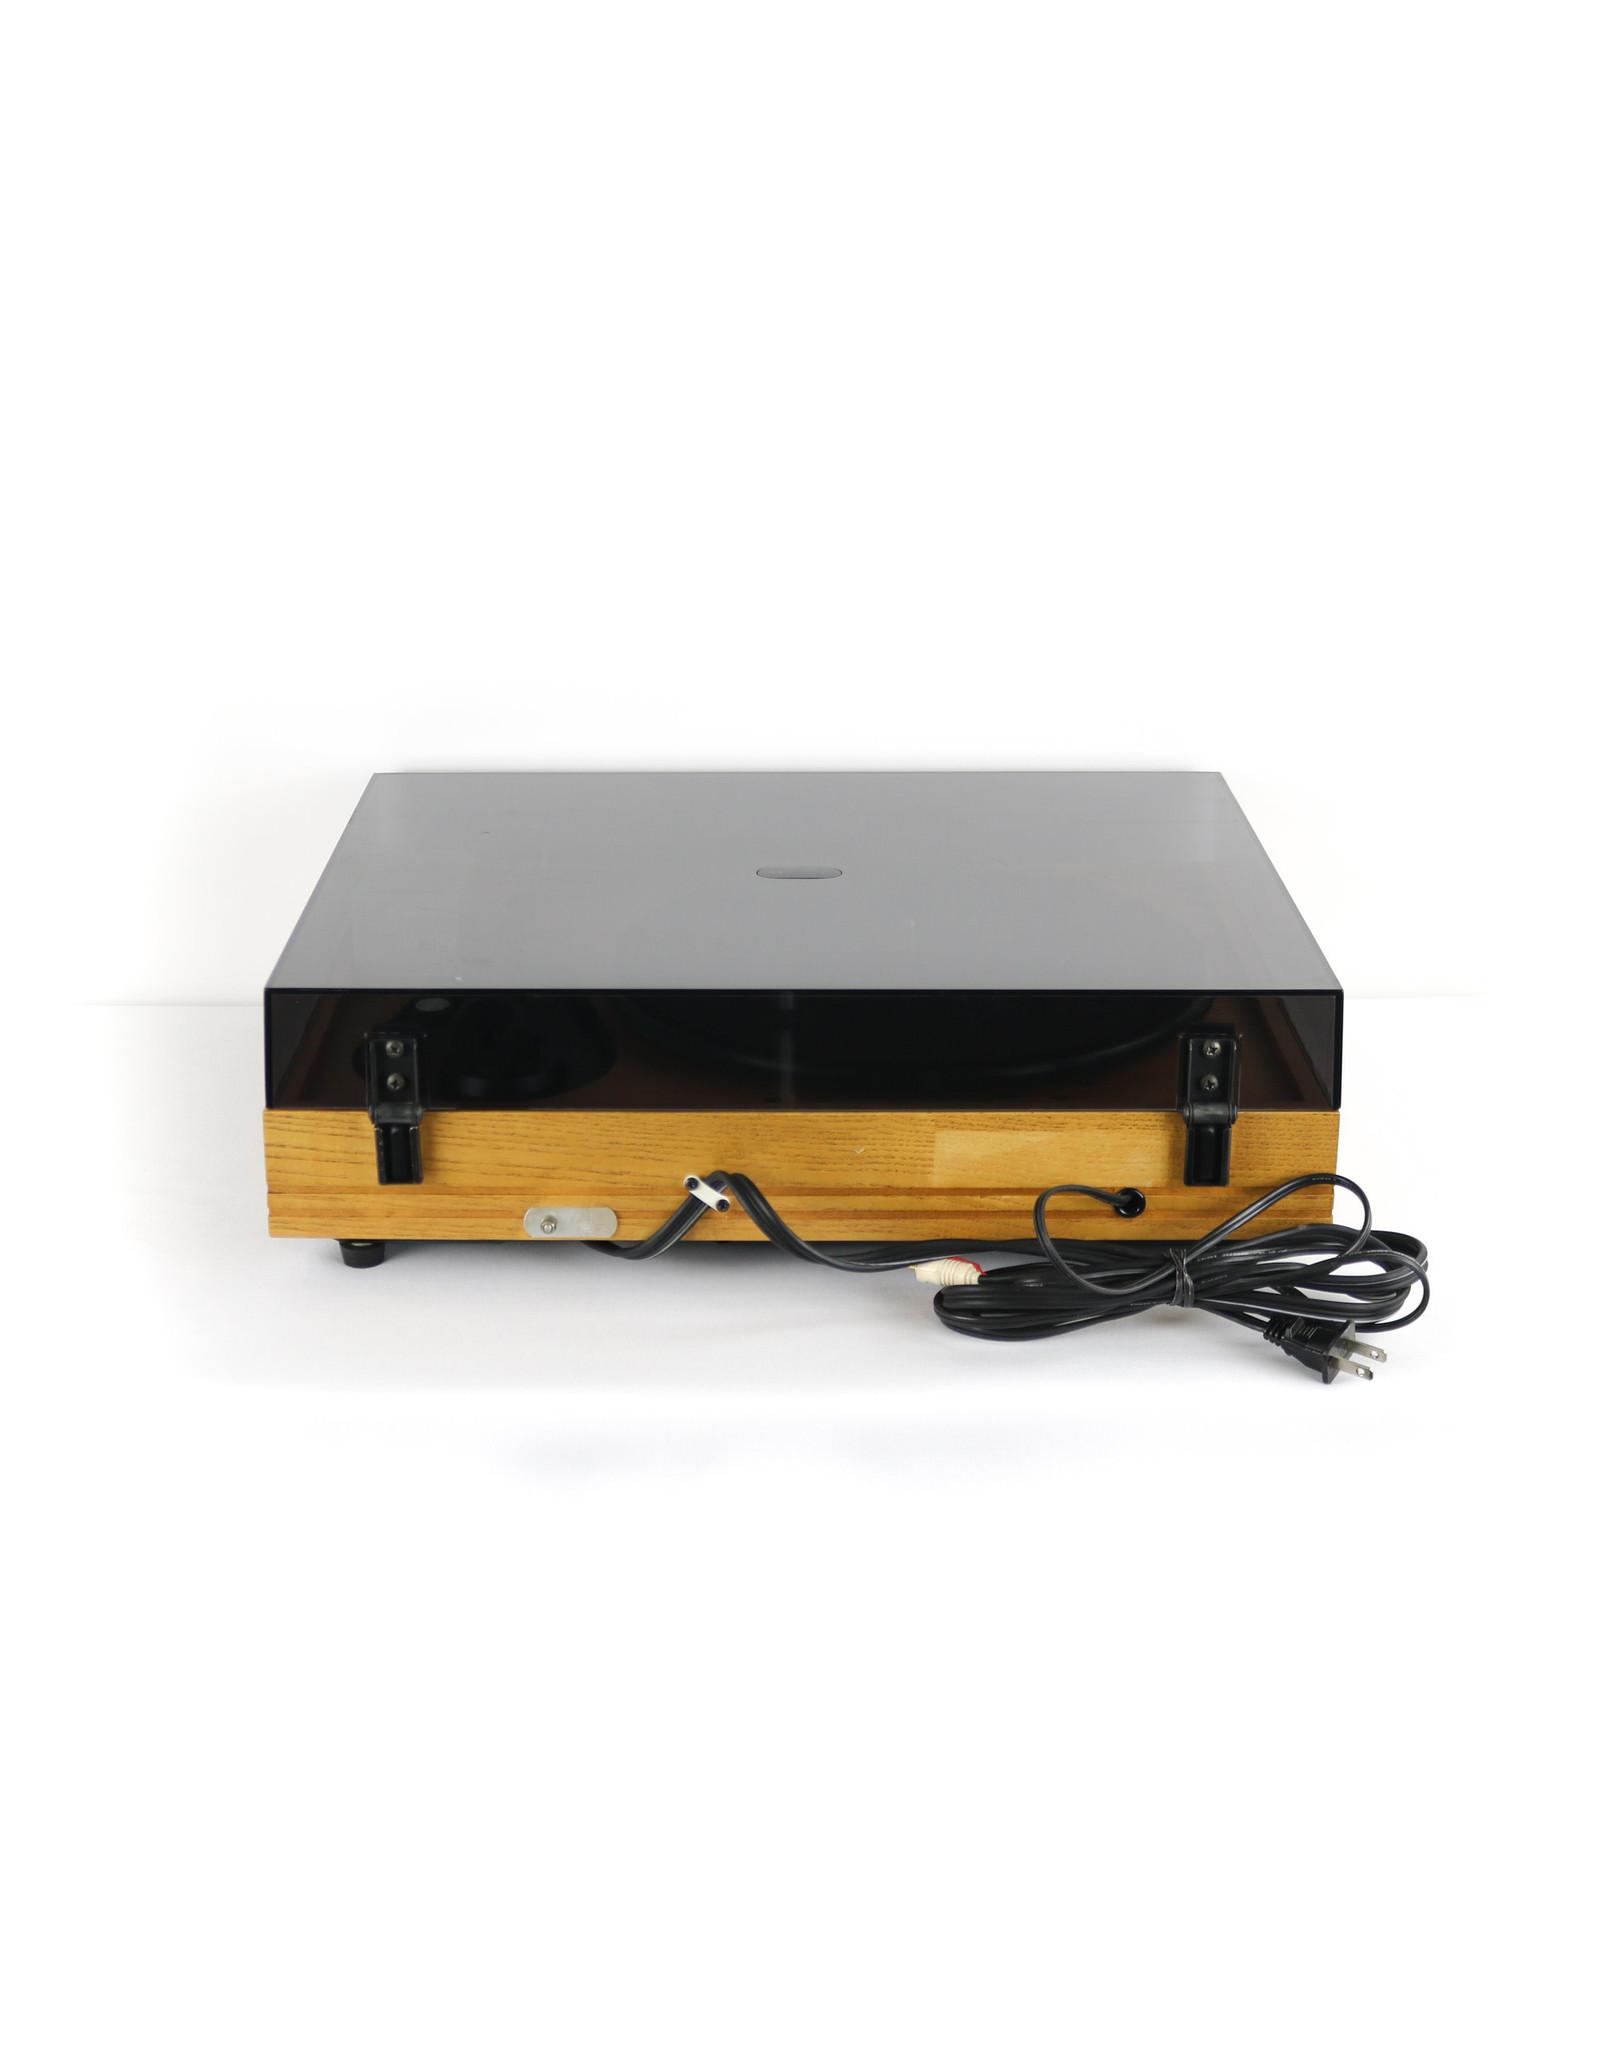 Systemdek Systemdek IIX Turntable USED